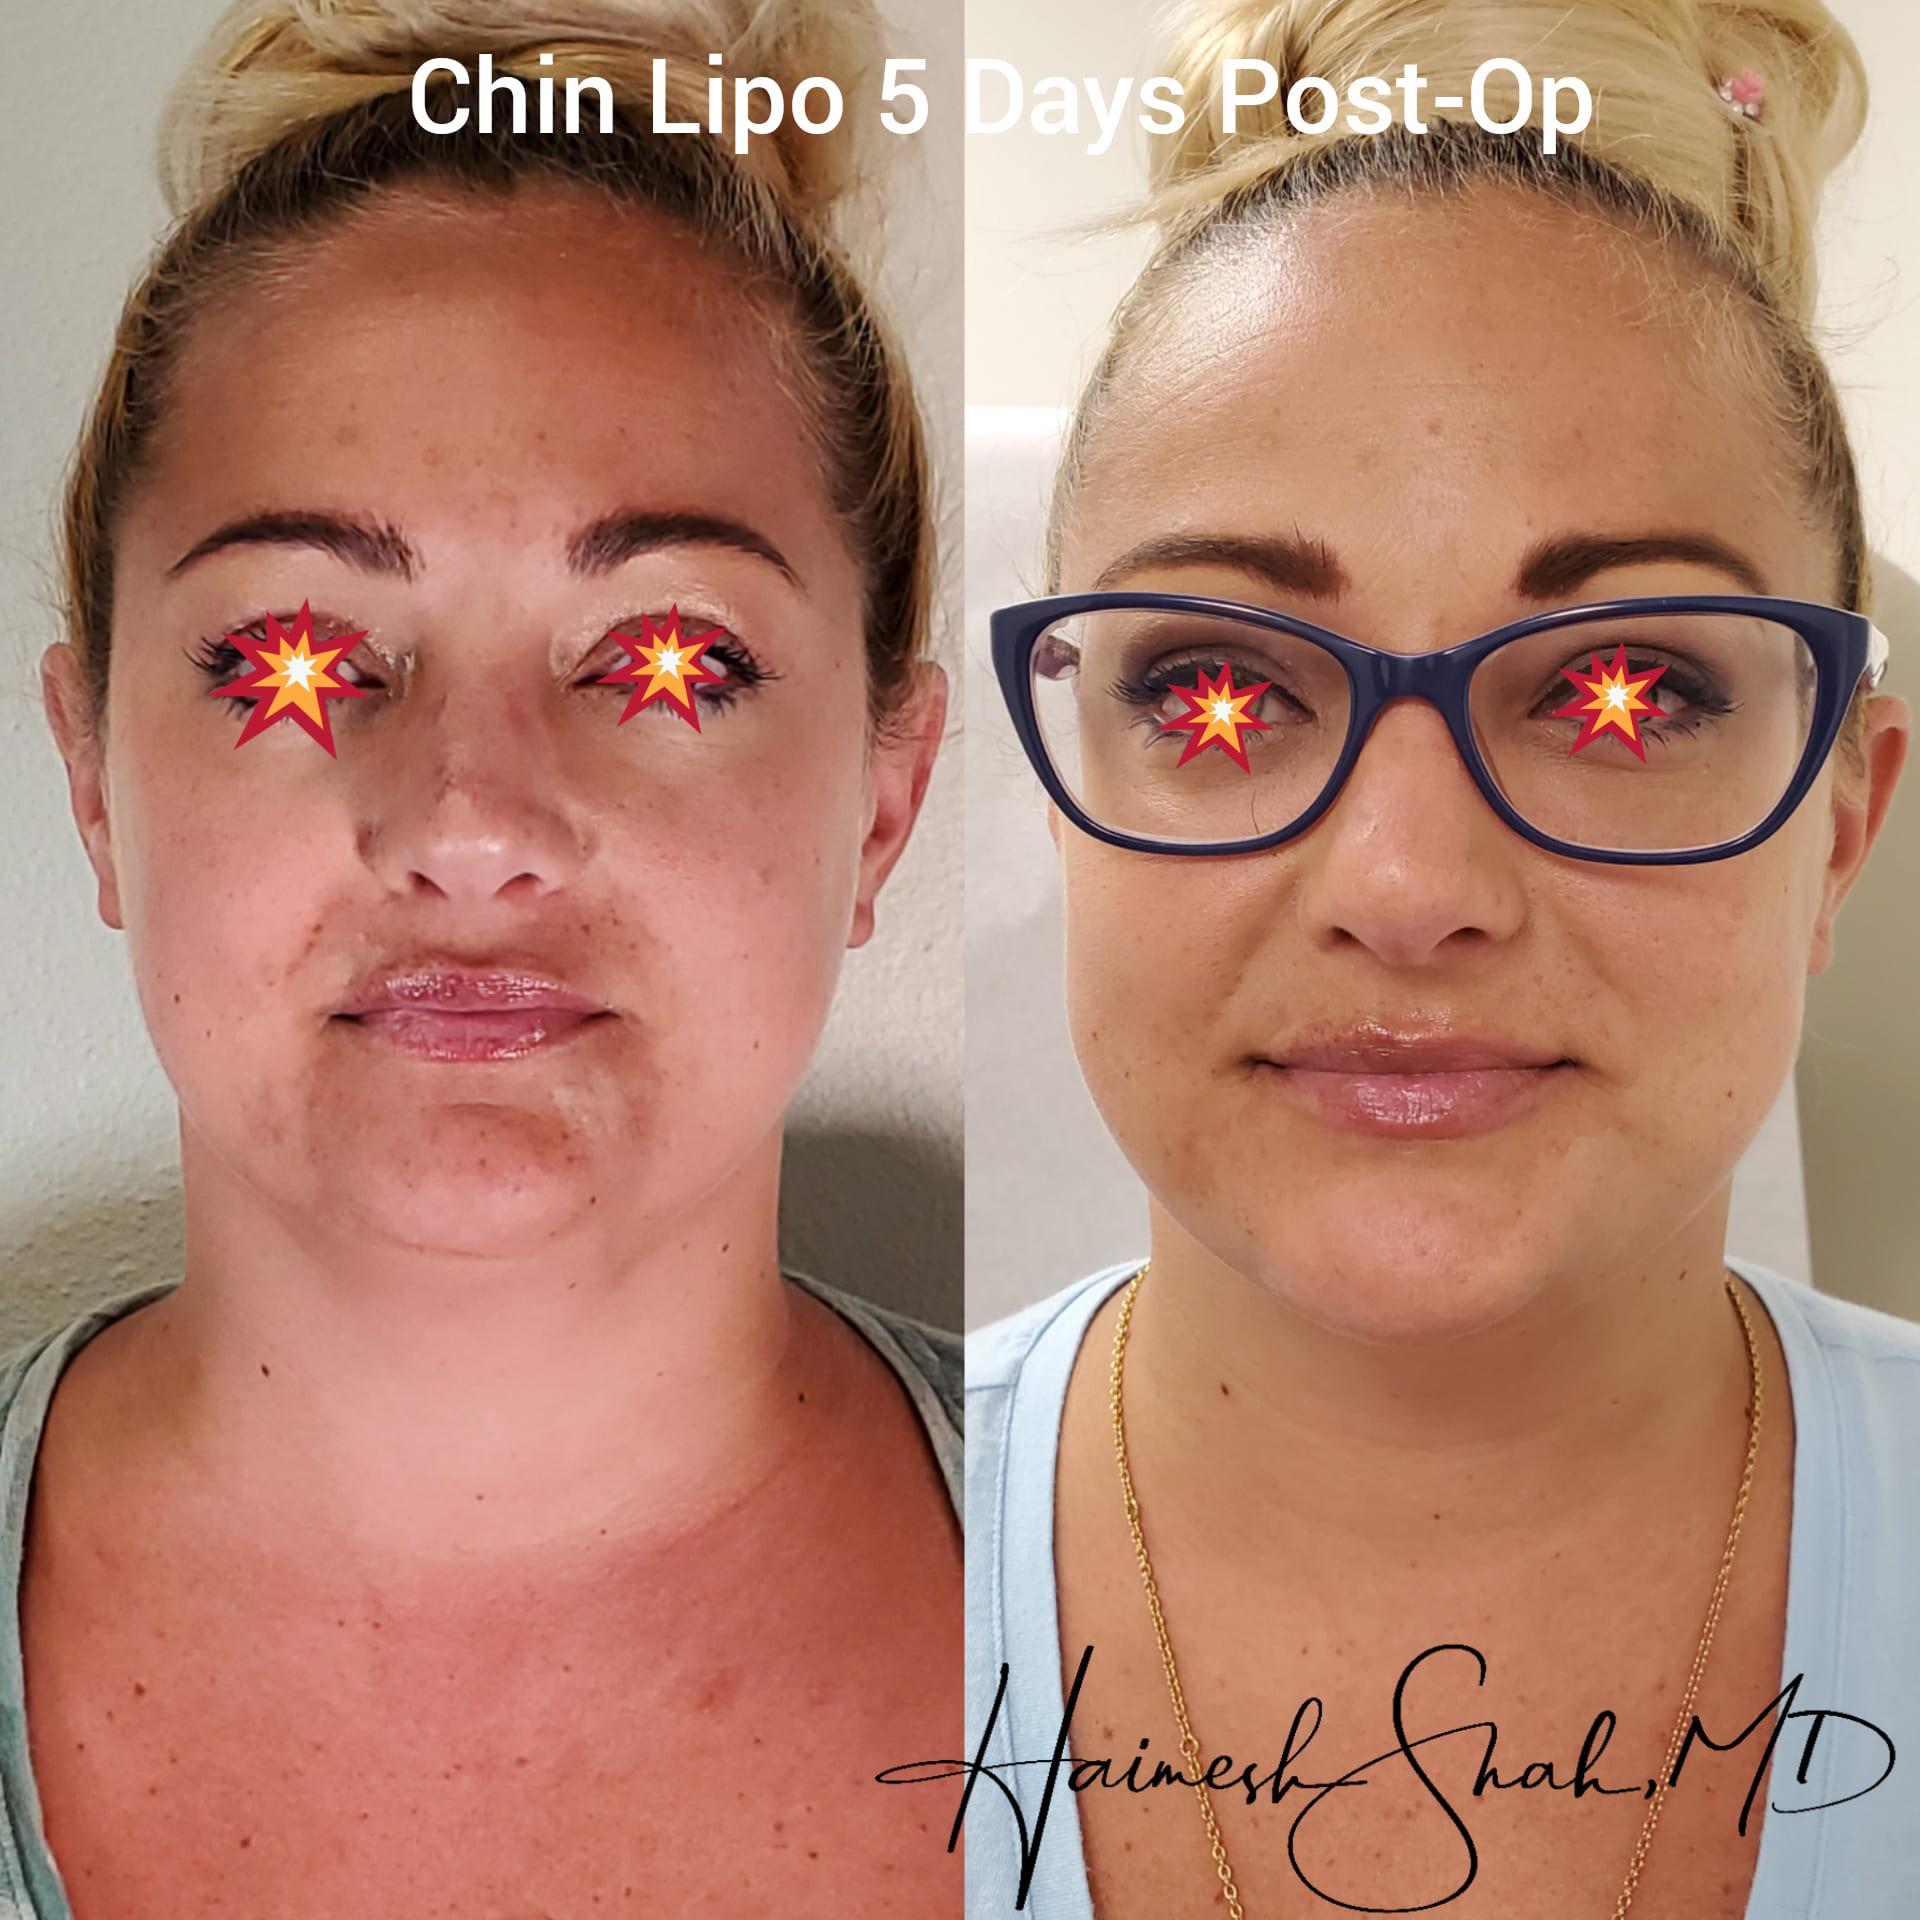 liposuction best treatment surgeon